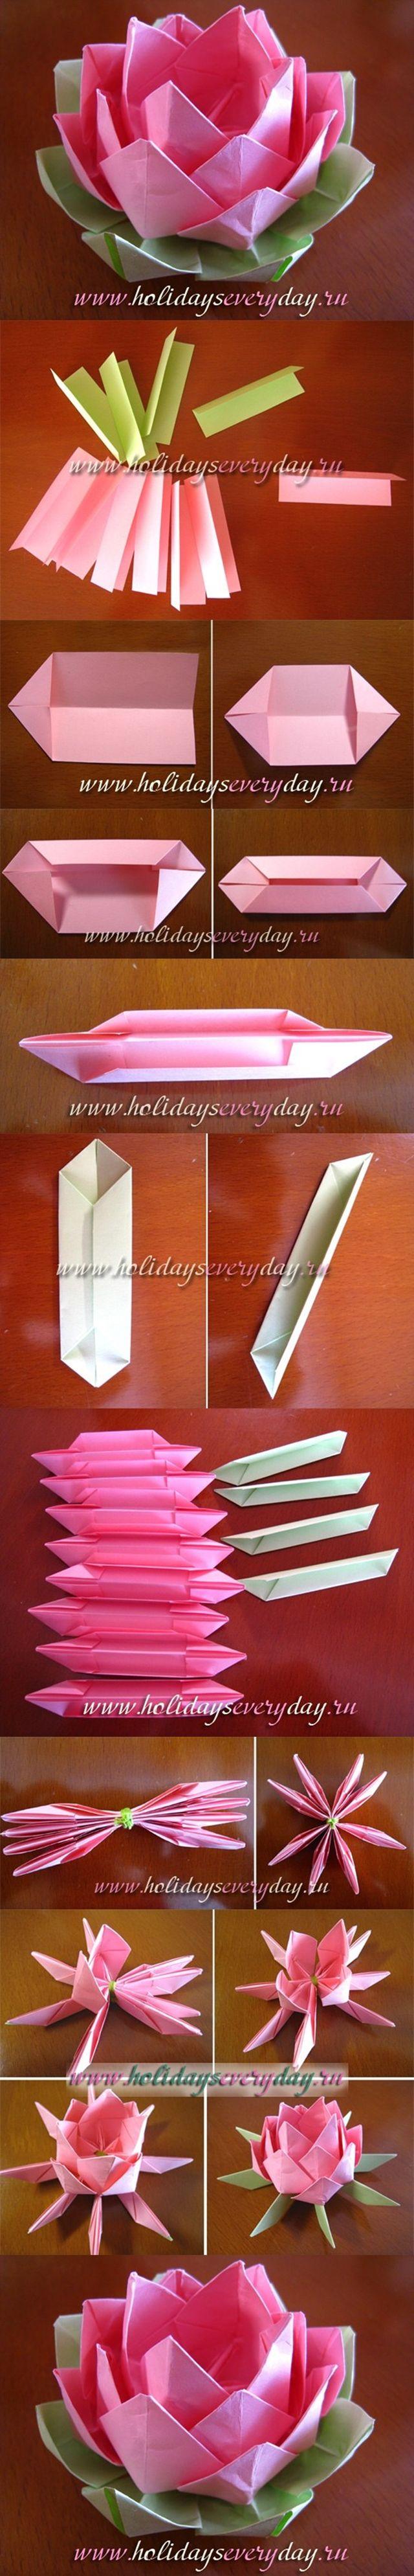 How to DIY Origami Paper Lotus Flower | www.FabArtDIY.com